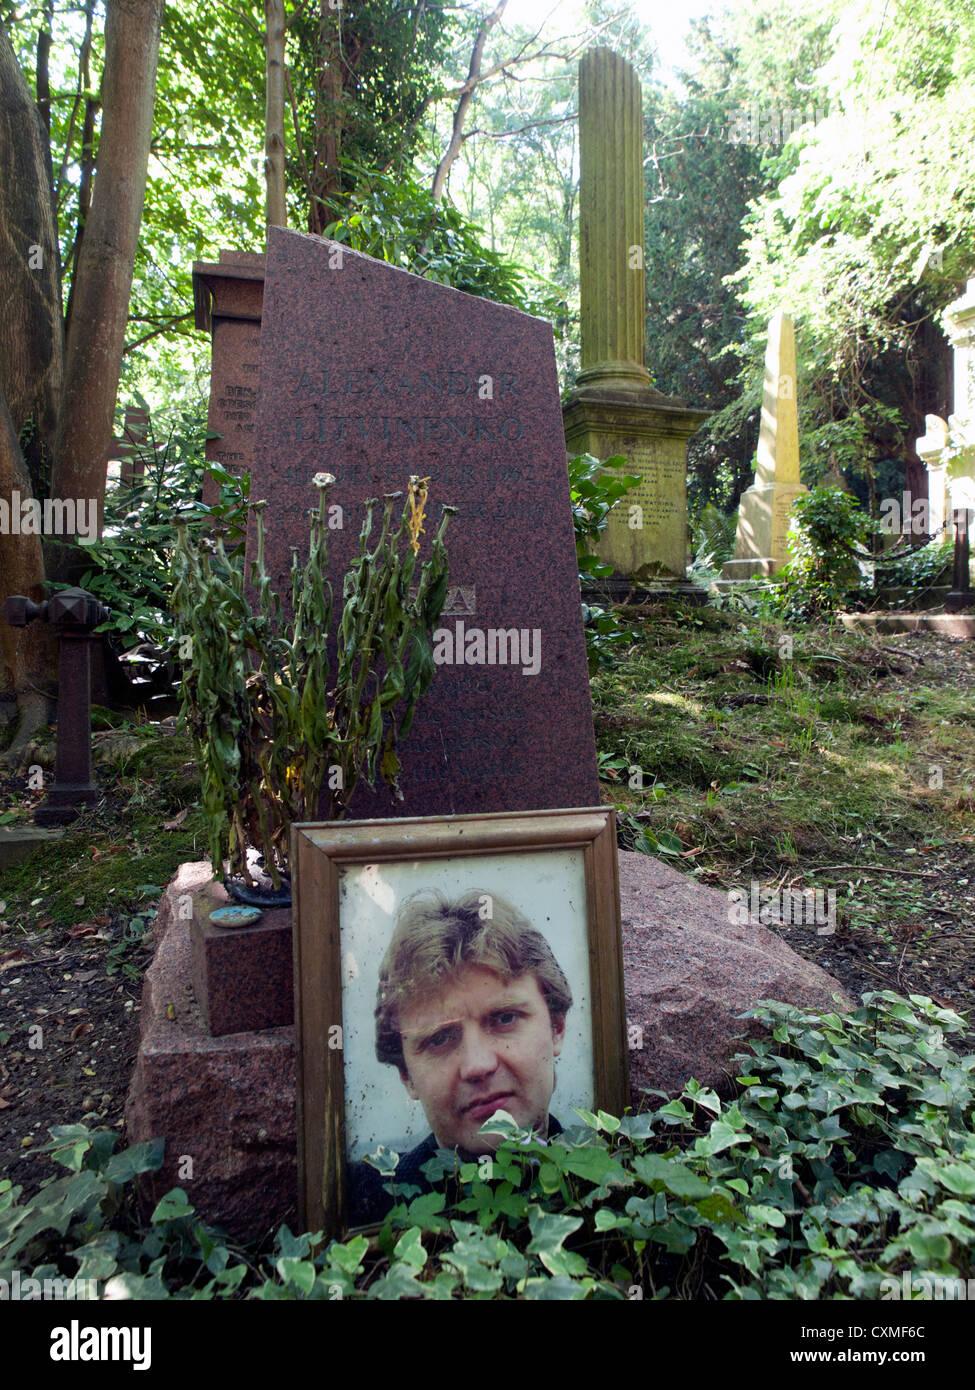 The grave of the murdered Russian,Alexander Litvinenko,in Highgate Cemetery. - Stock Image